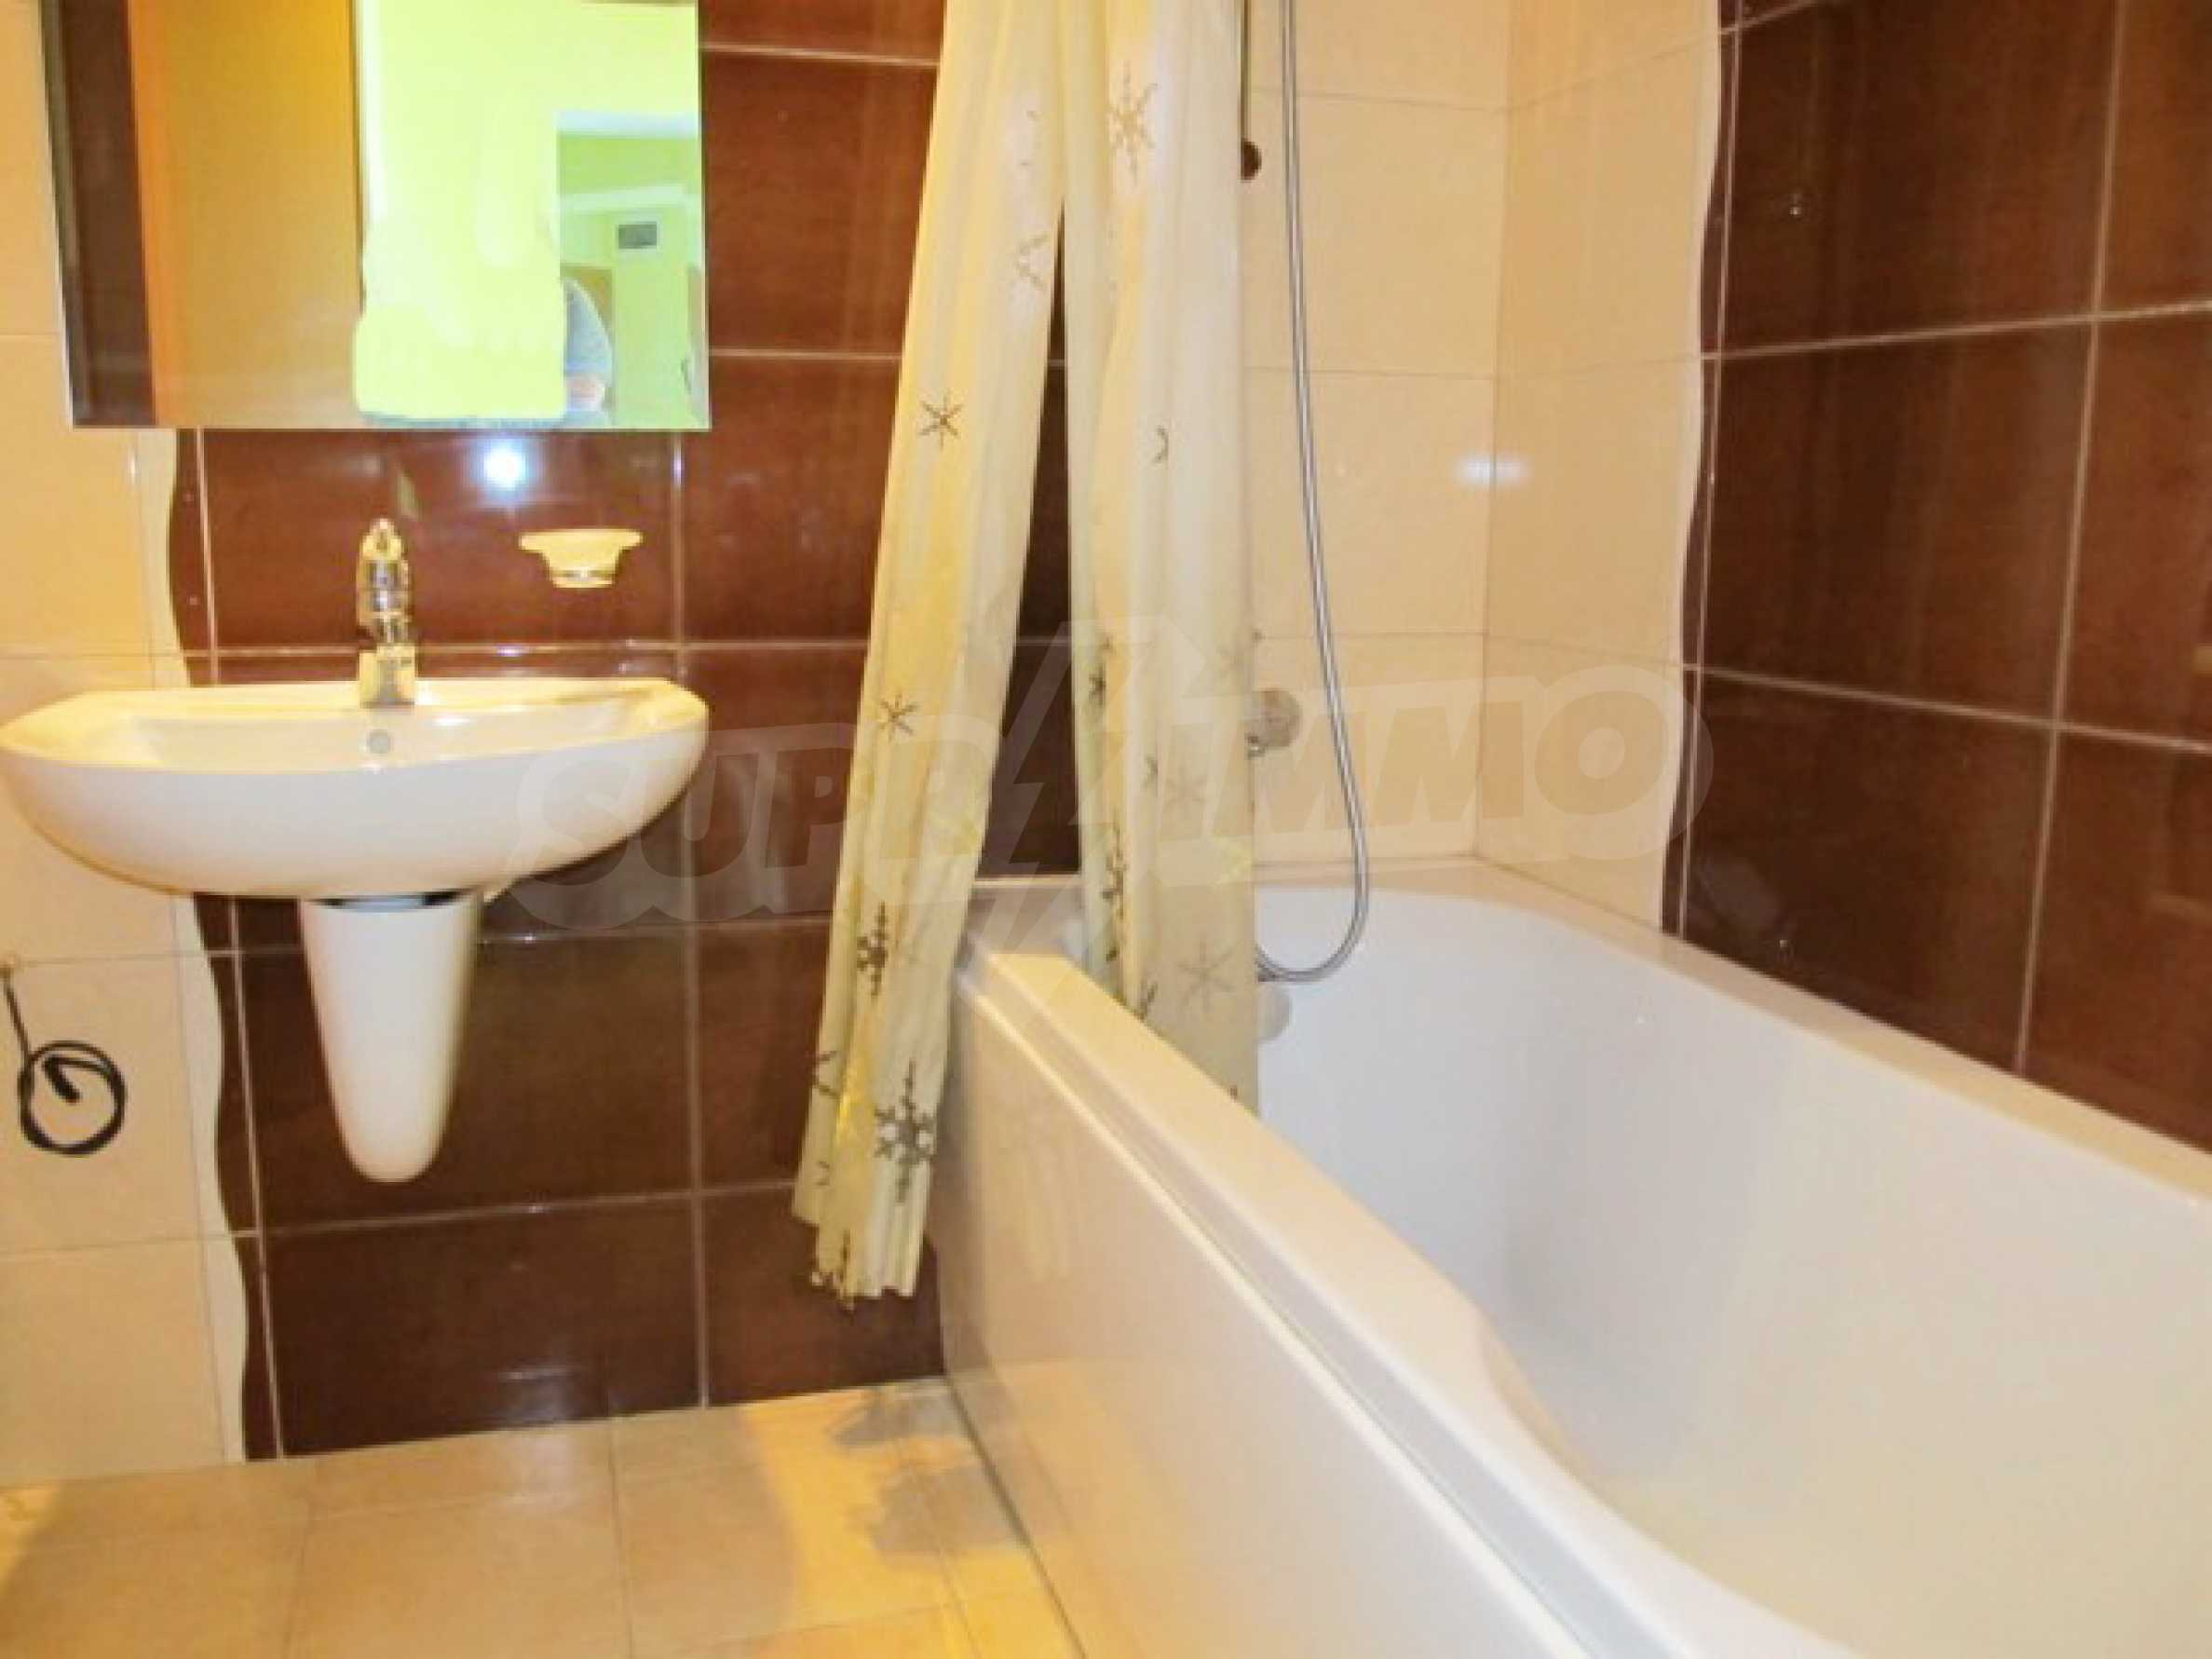 Тристаен апартамент за продажба в Поморие 21